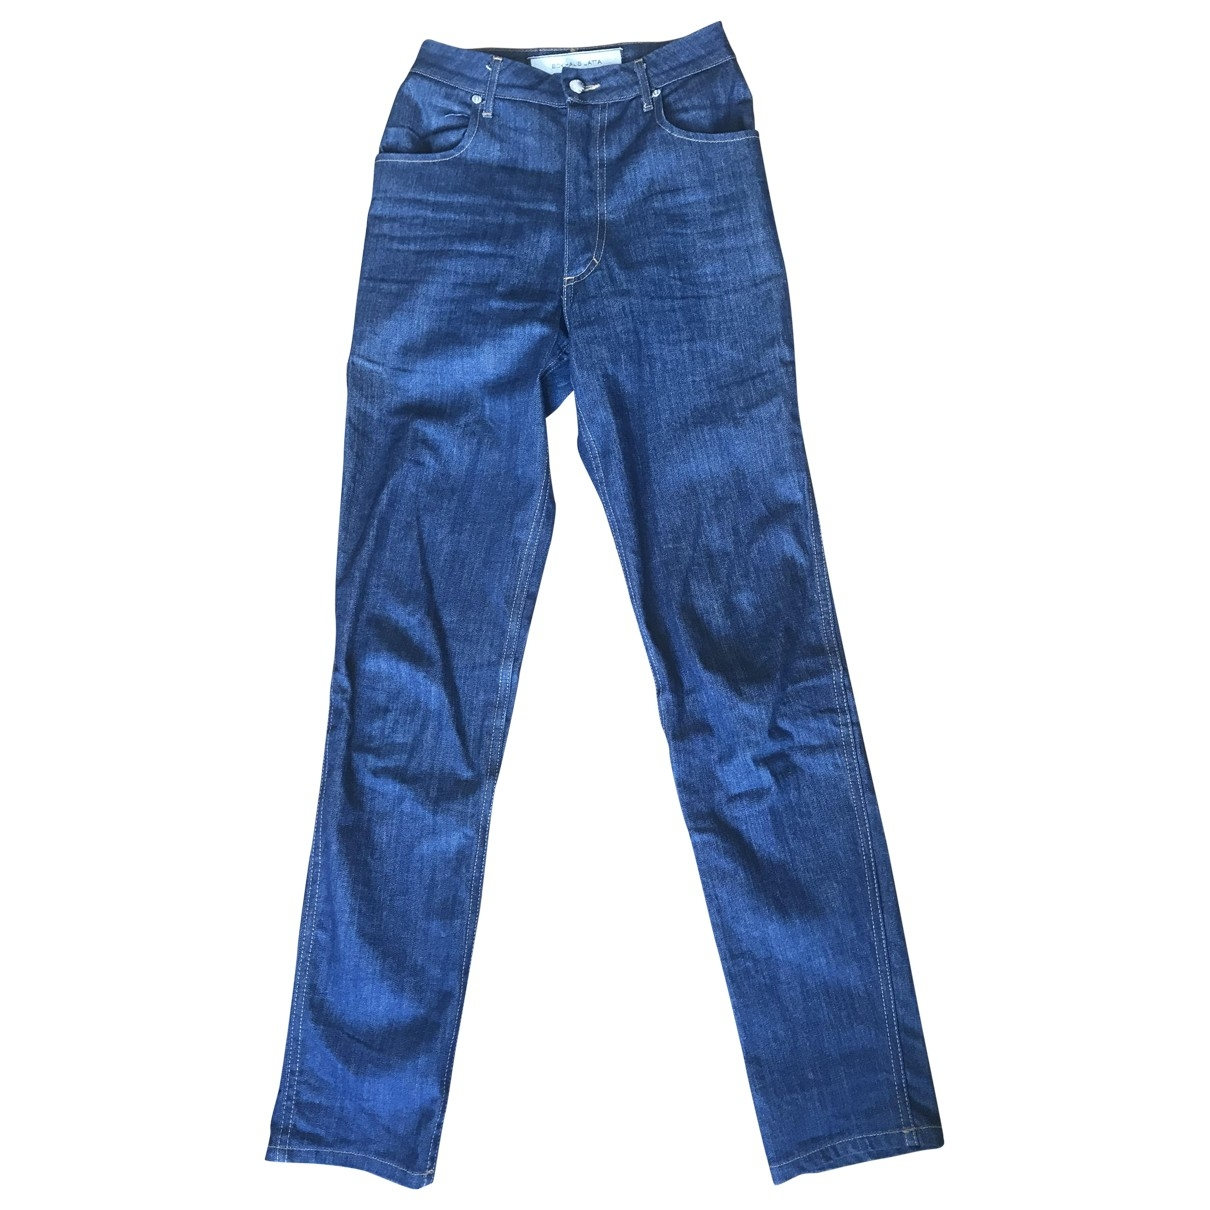 Eckhaus Latta \N Blue Denim - Jeans Jeans for Women 25 US